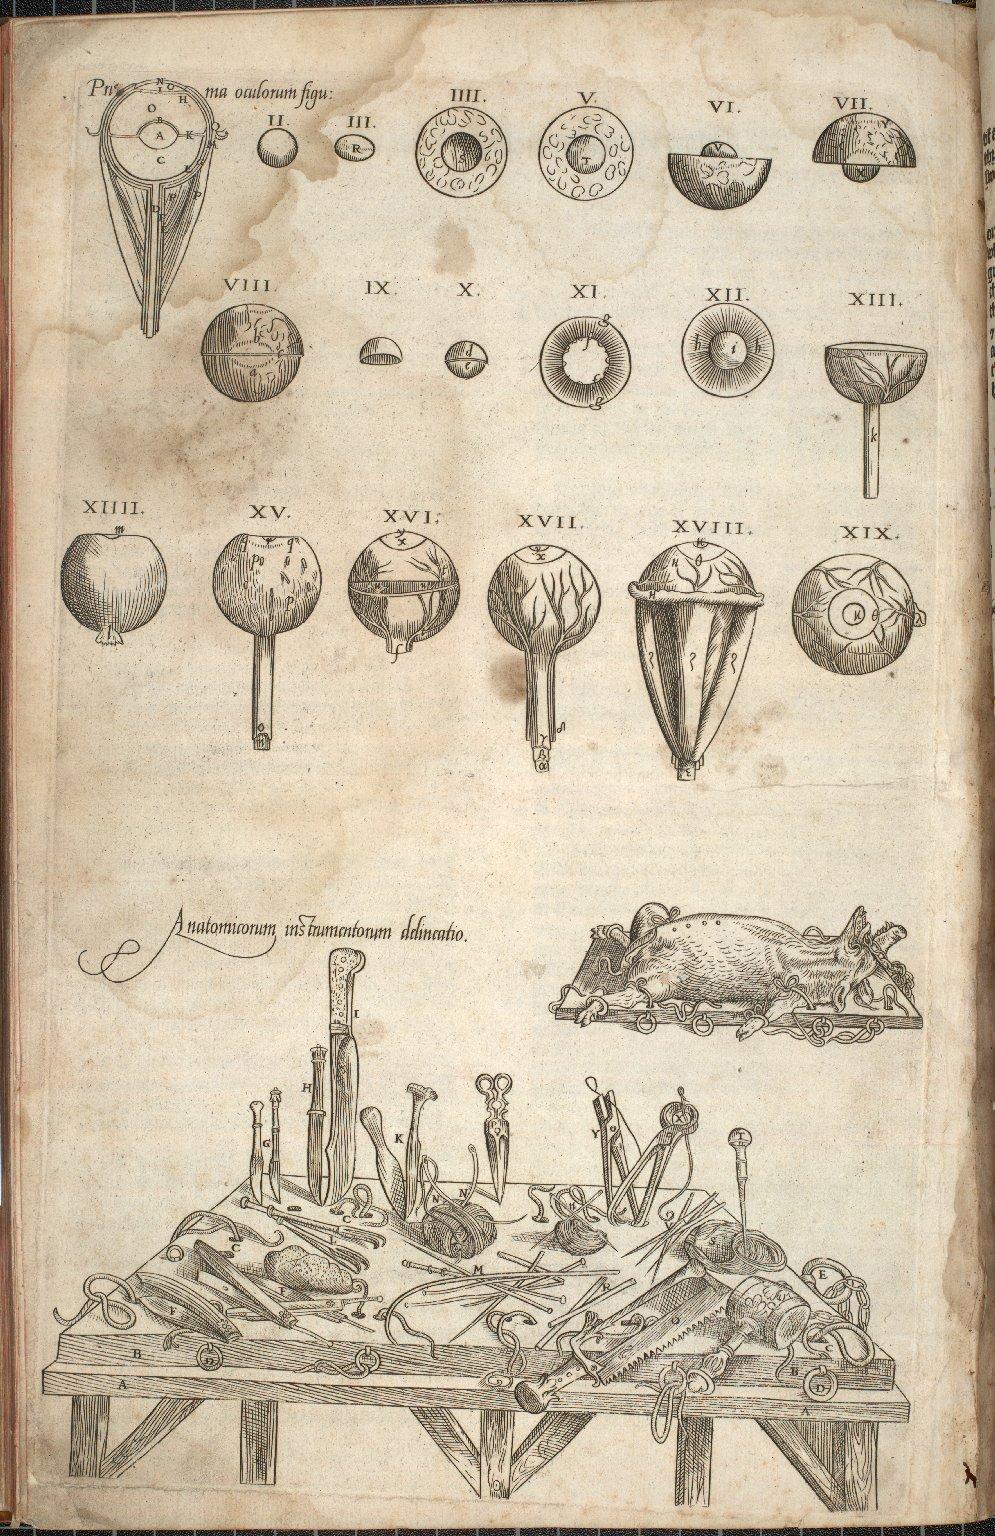 Prima Oculorum figu: [and] Anatomicorum instrumentorum delineatio